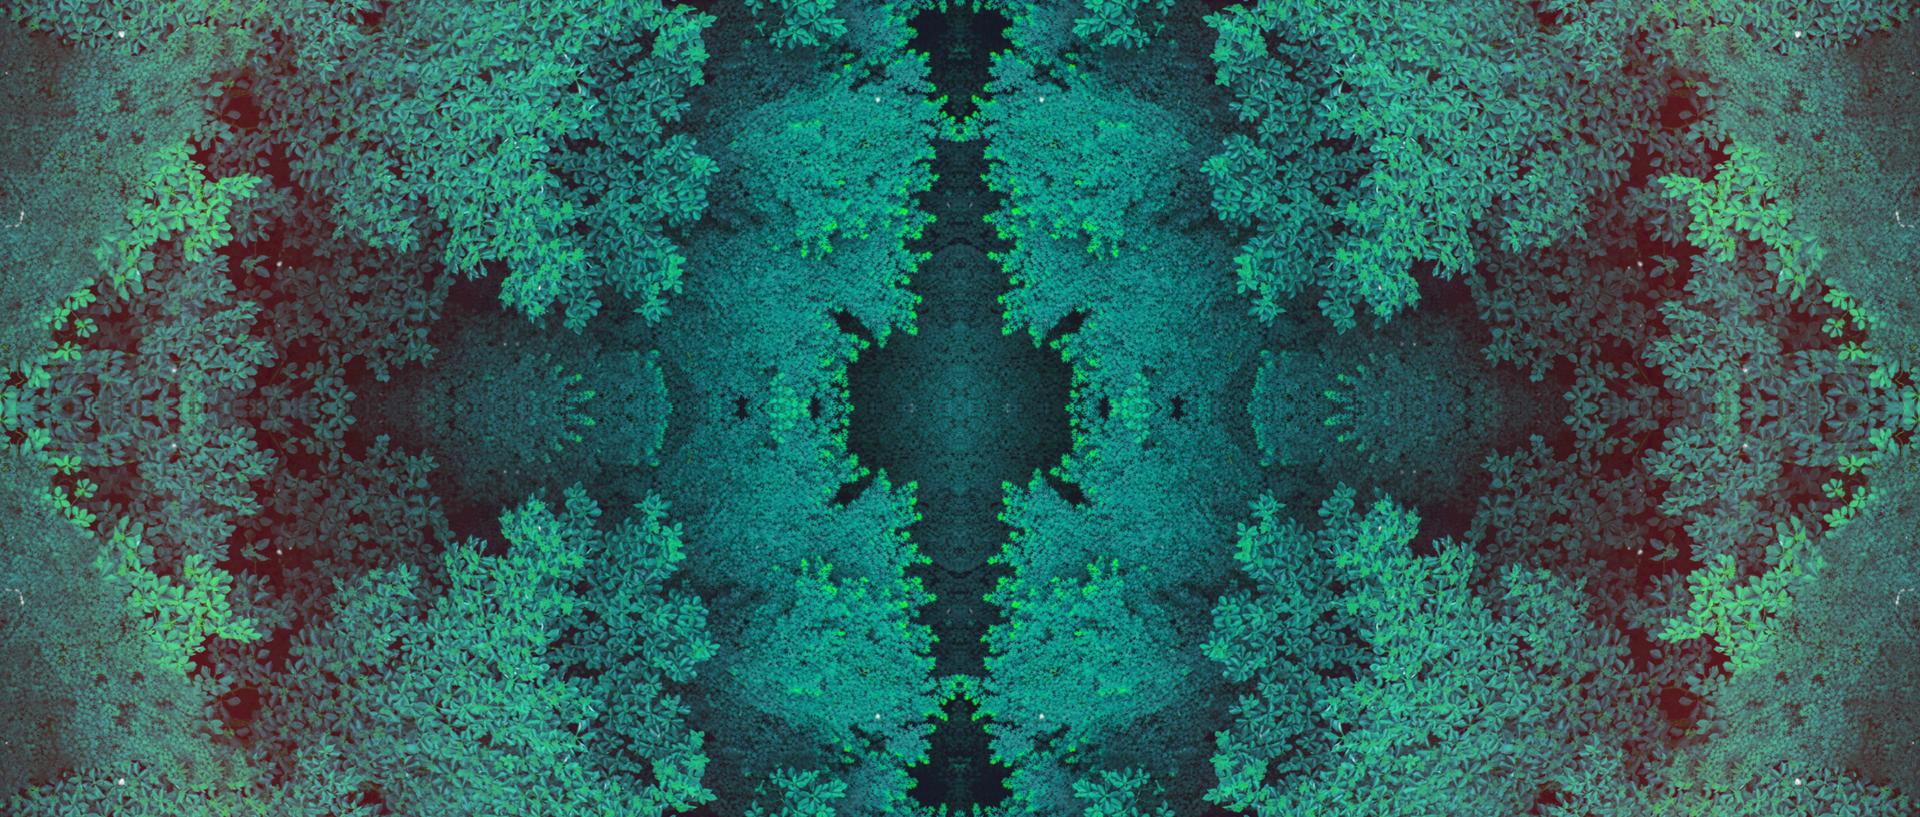 tycho_easy_fractal_03